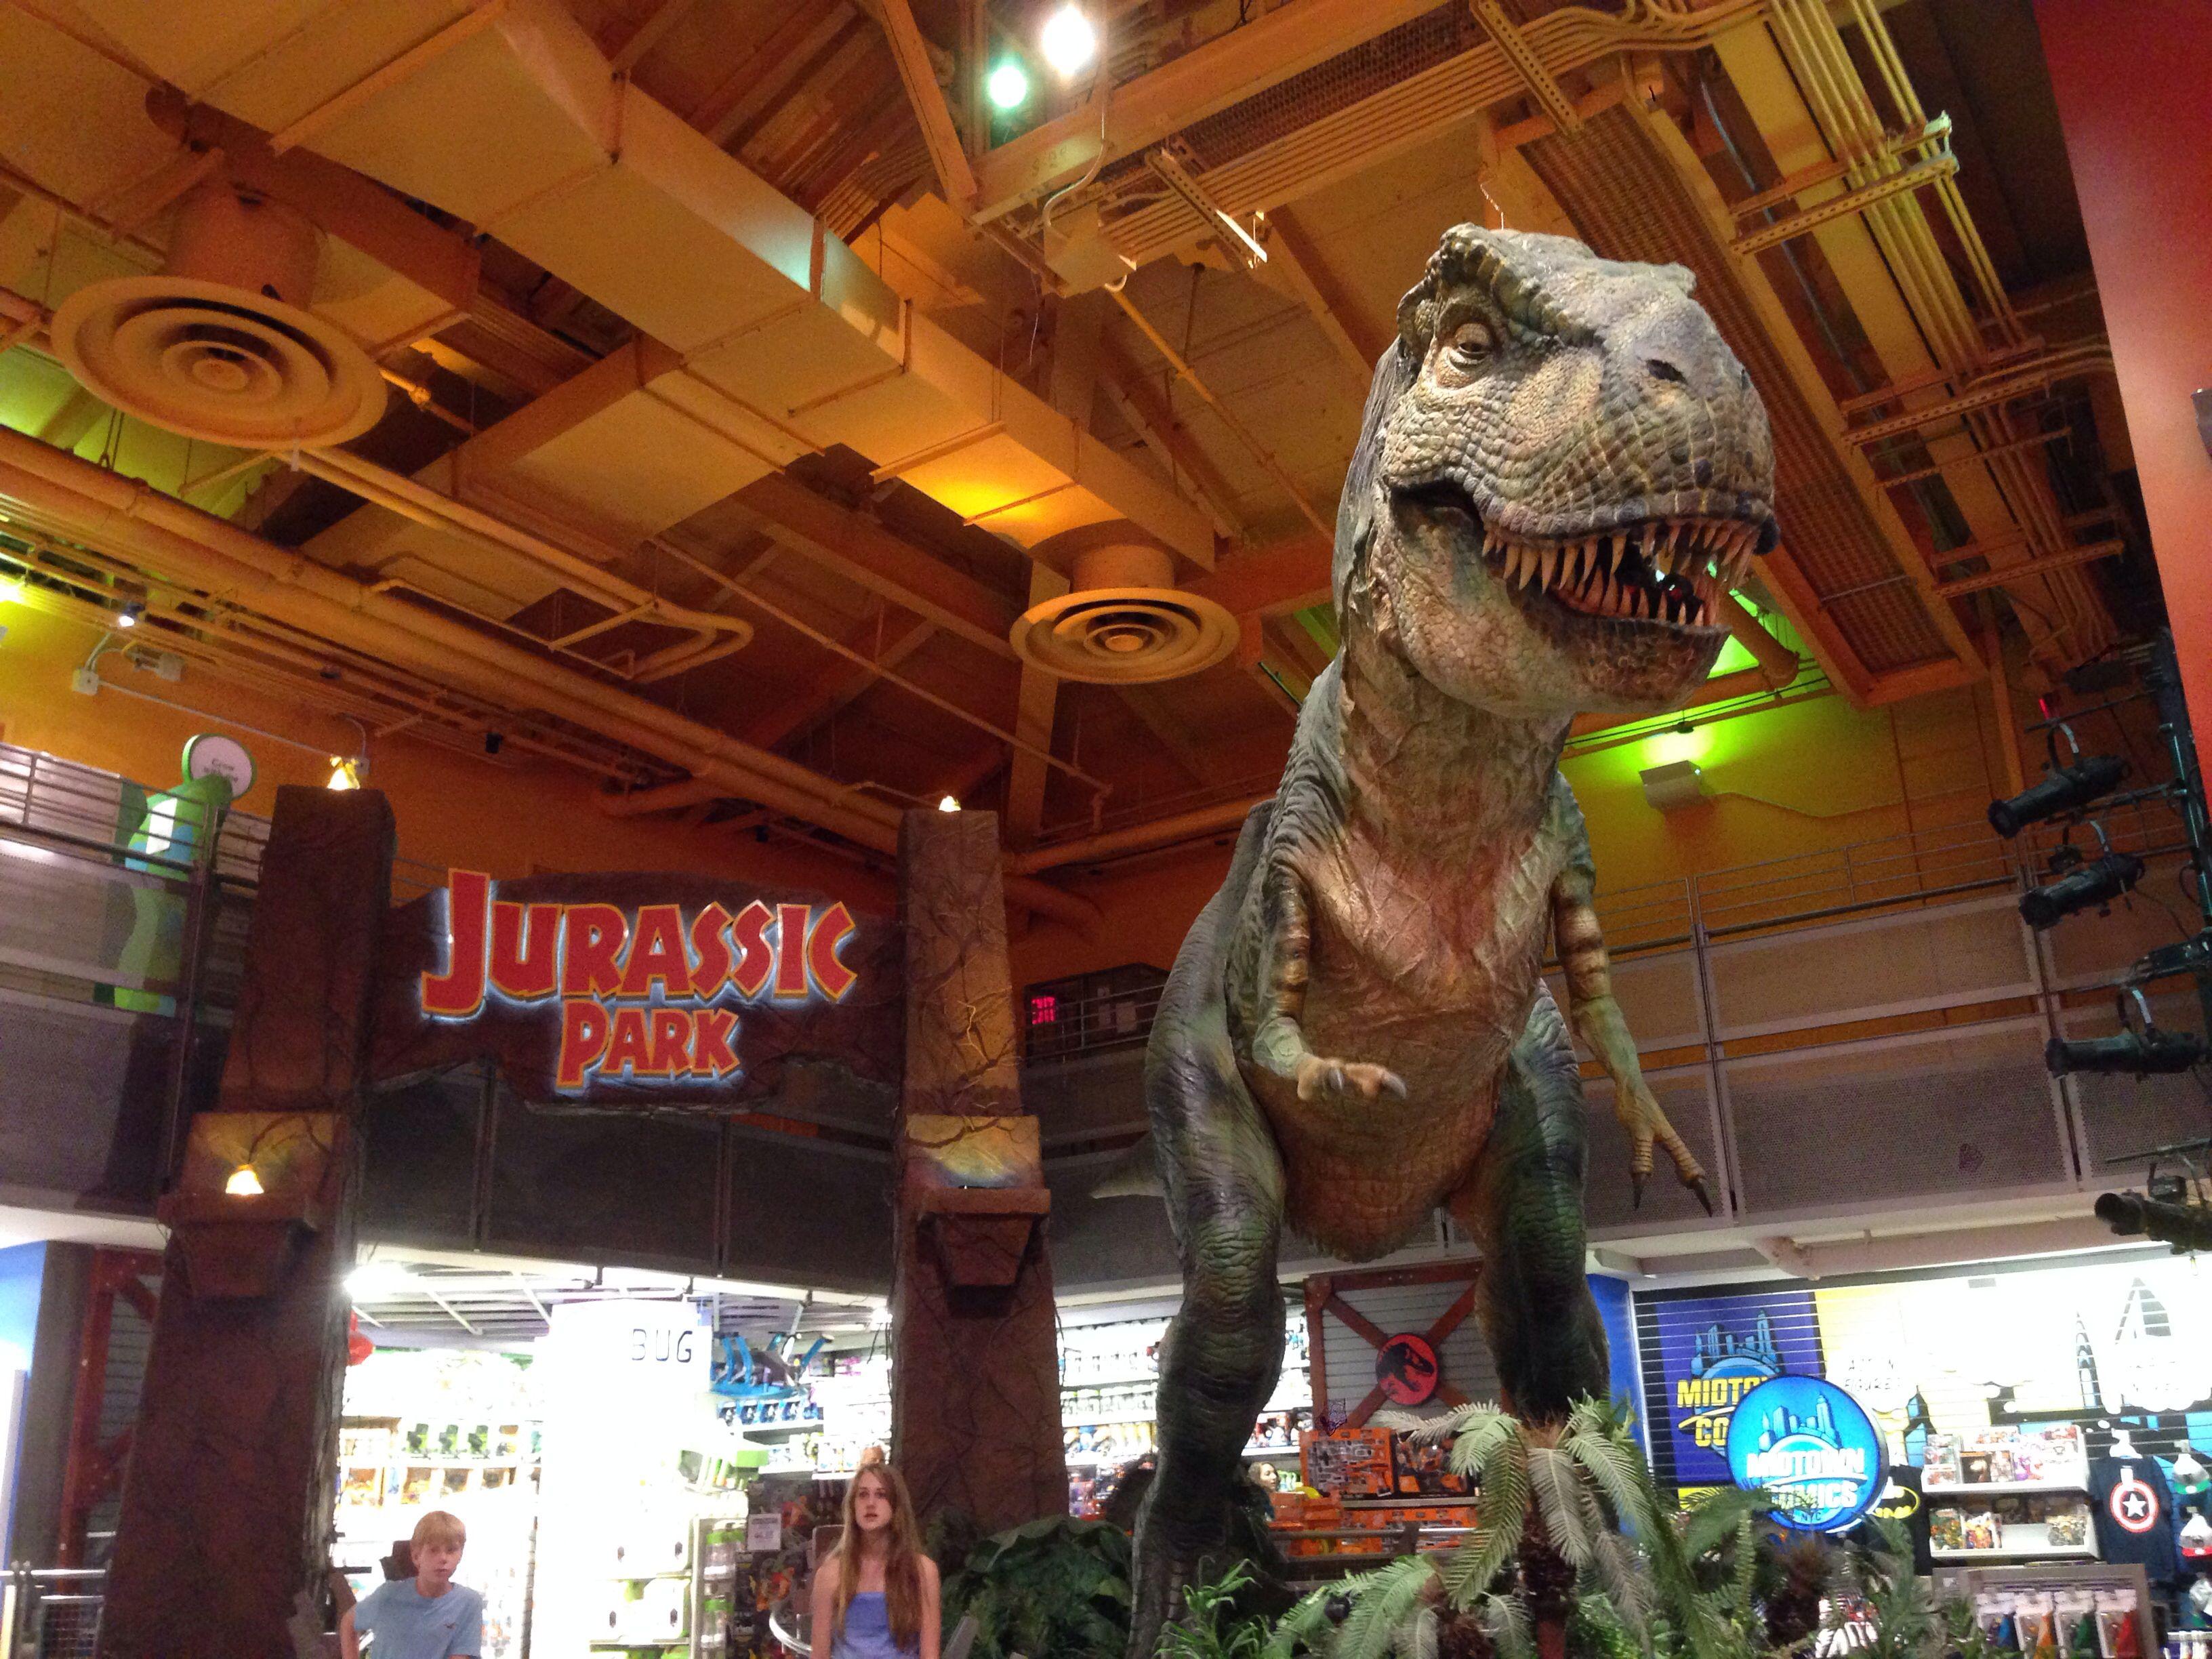 Jurassic Park New York City Jurassic Park York City